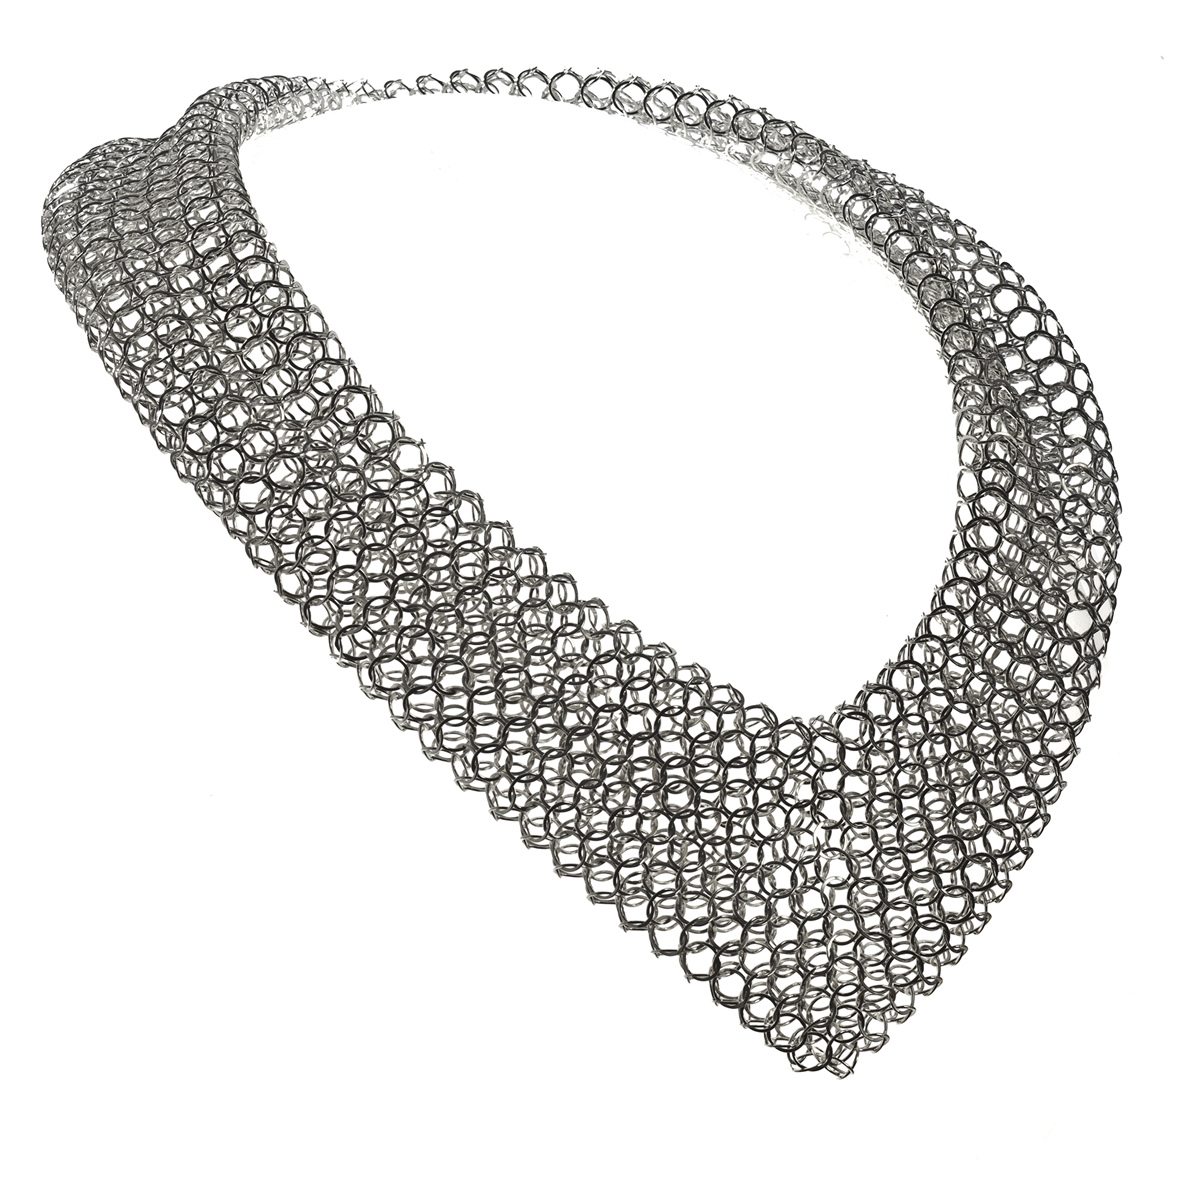 Ewin necklace, silver